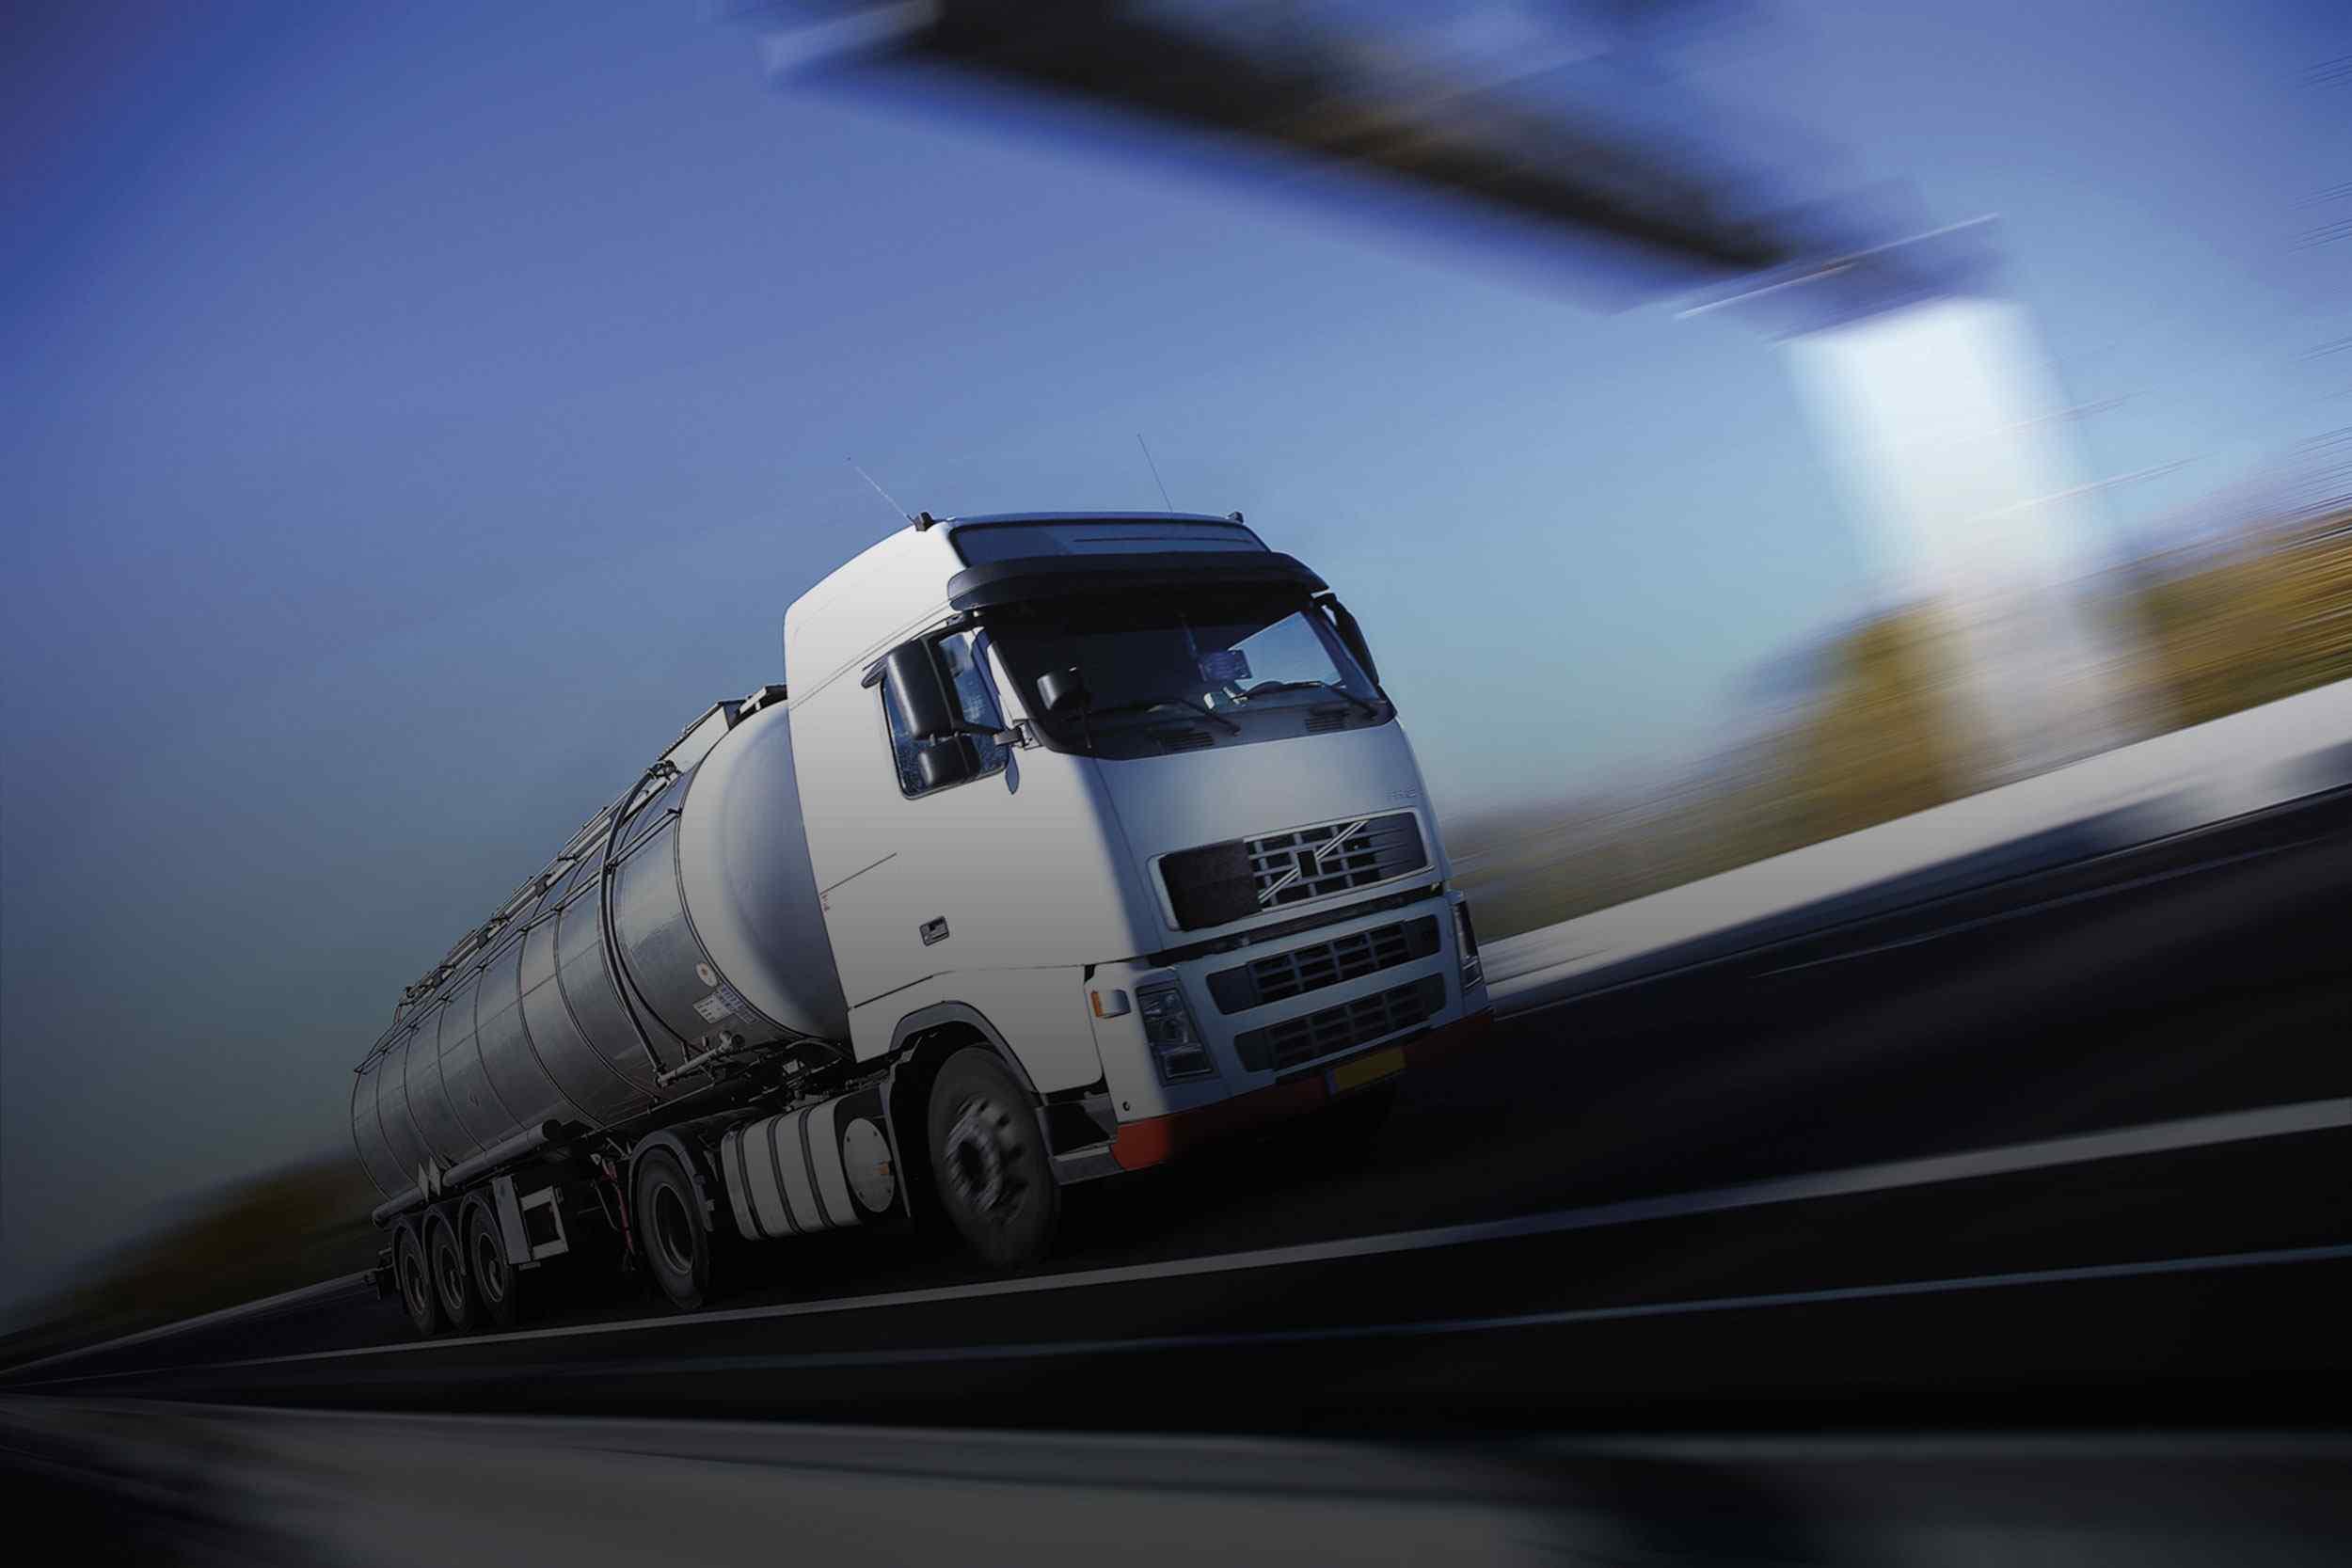 https://cobe-transport-logistics.com/wp-content/uploads/2015/09/White-Truck-single.jpg